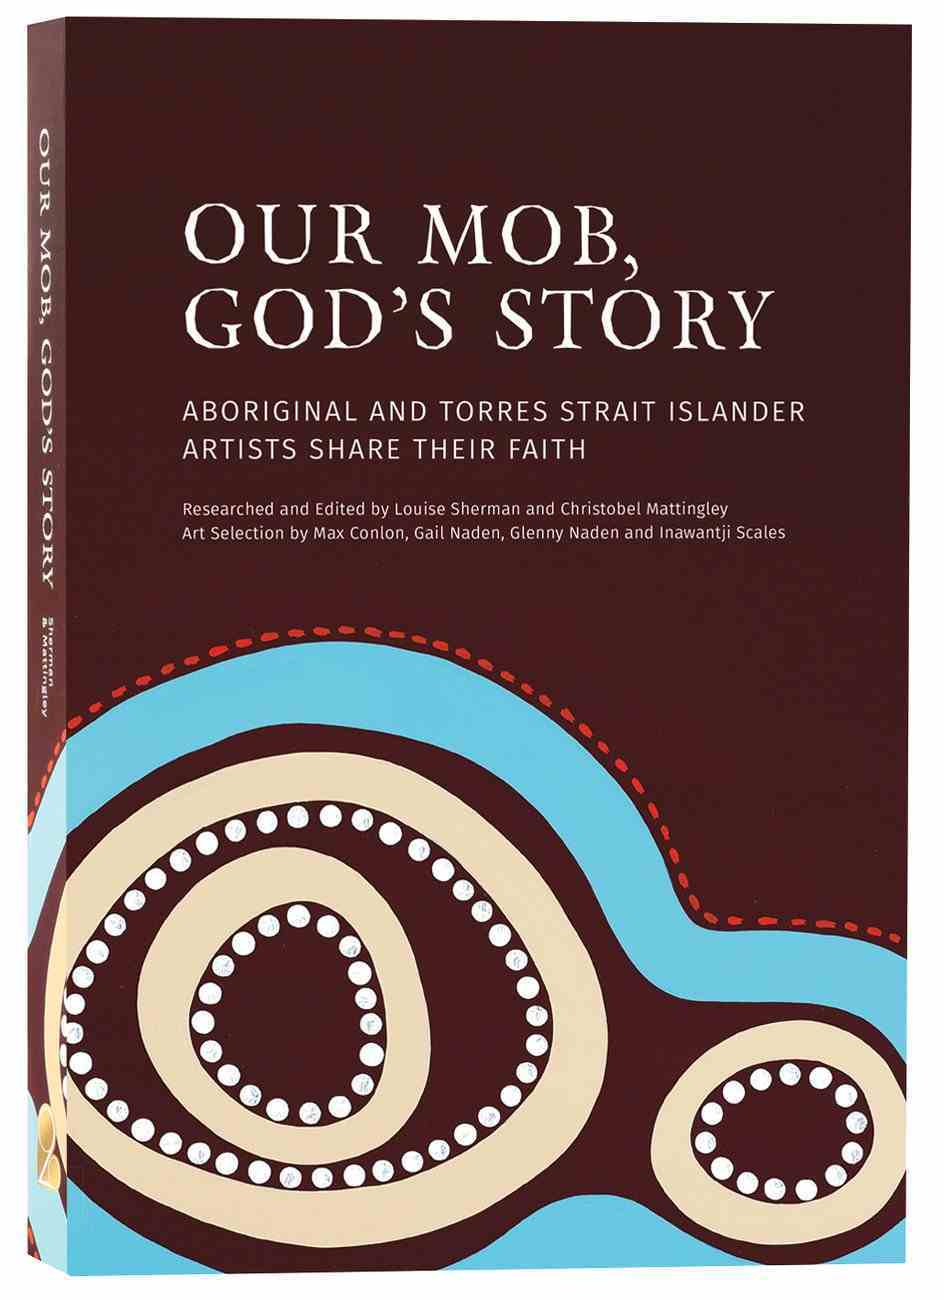 Our Mob, God's Story: Aboriginal and Torres Strait Islander Christianity (With Slip Case) Hardback